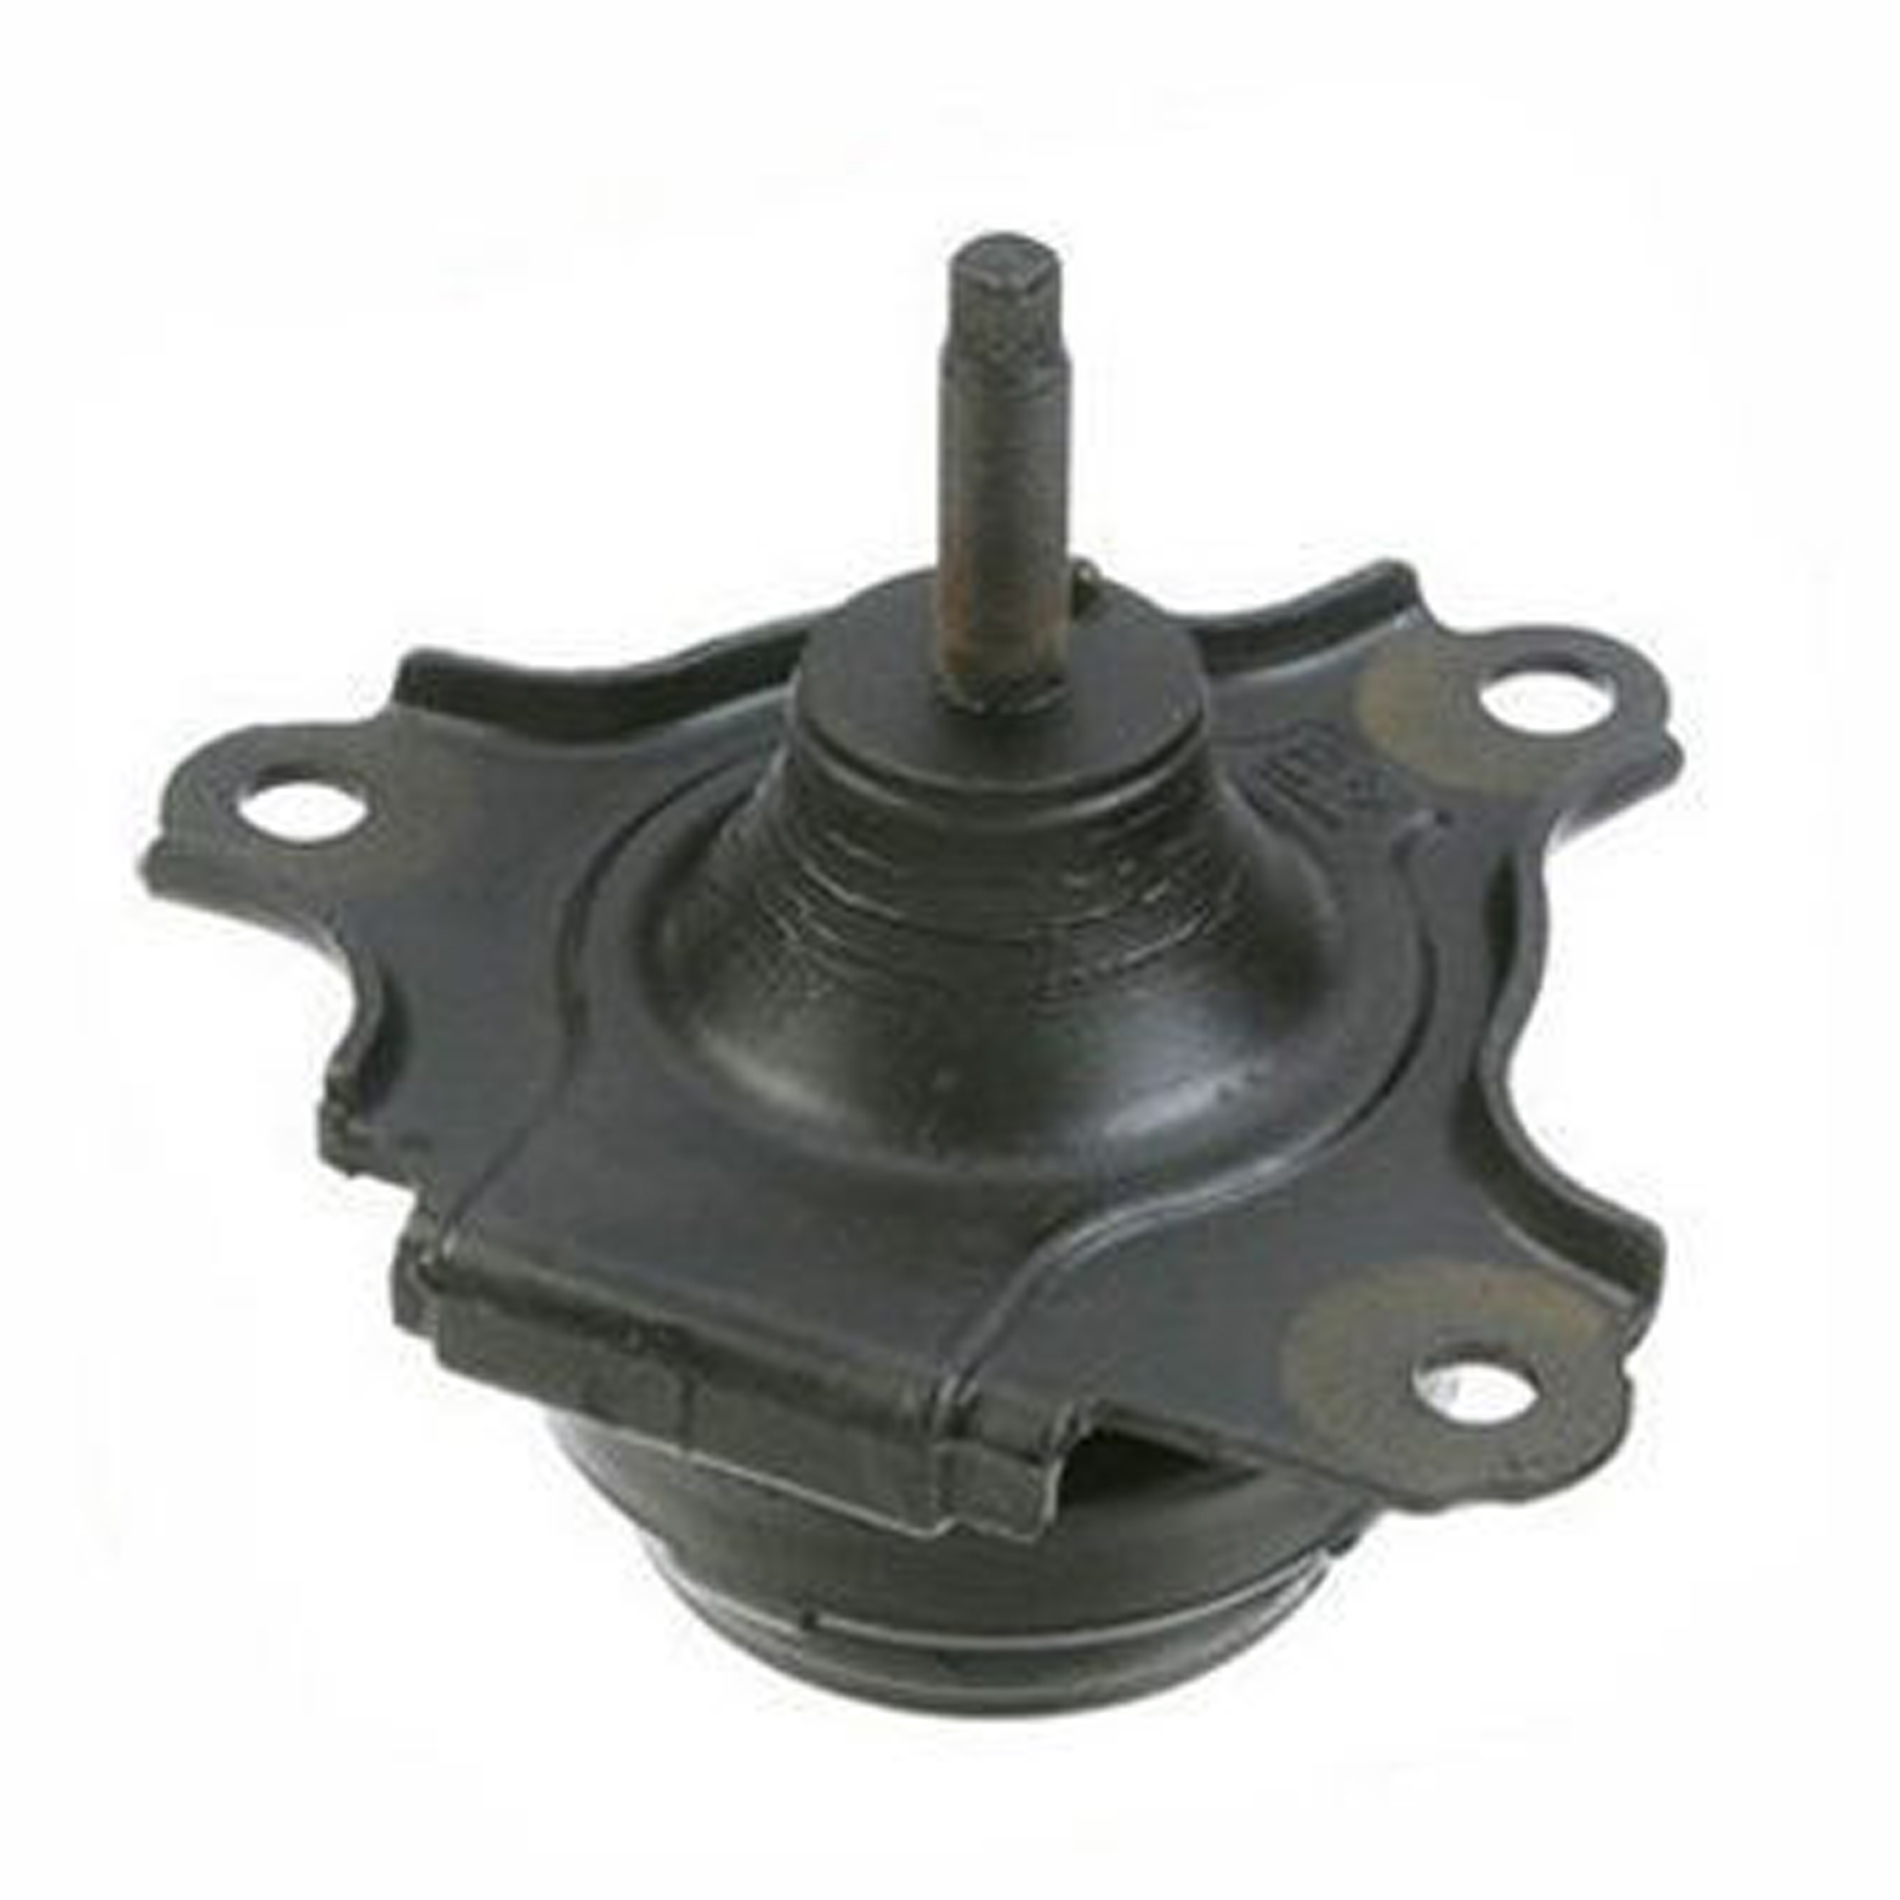 4AMCA A4567 EM-9413 Front Right Engine Motor Mount For 02